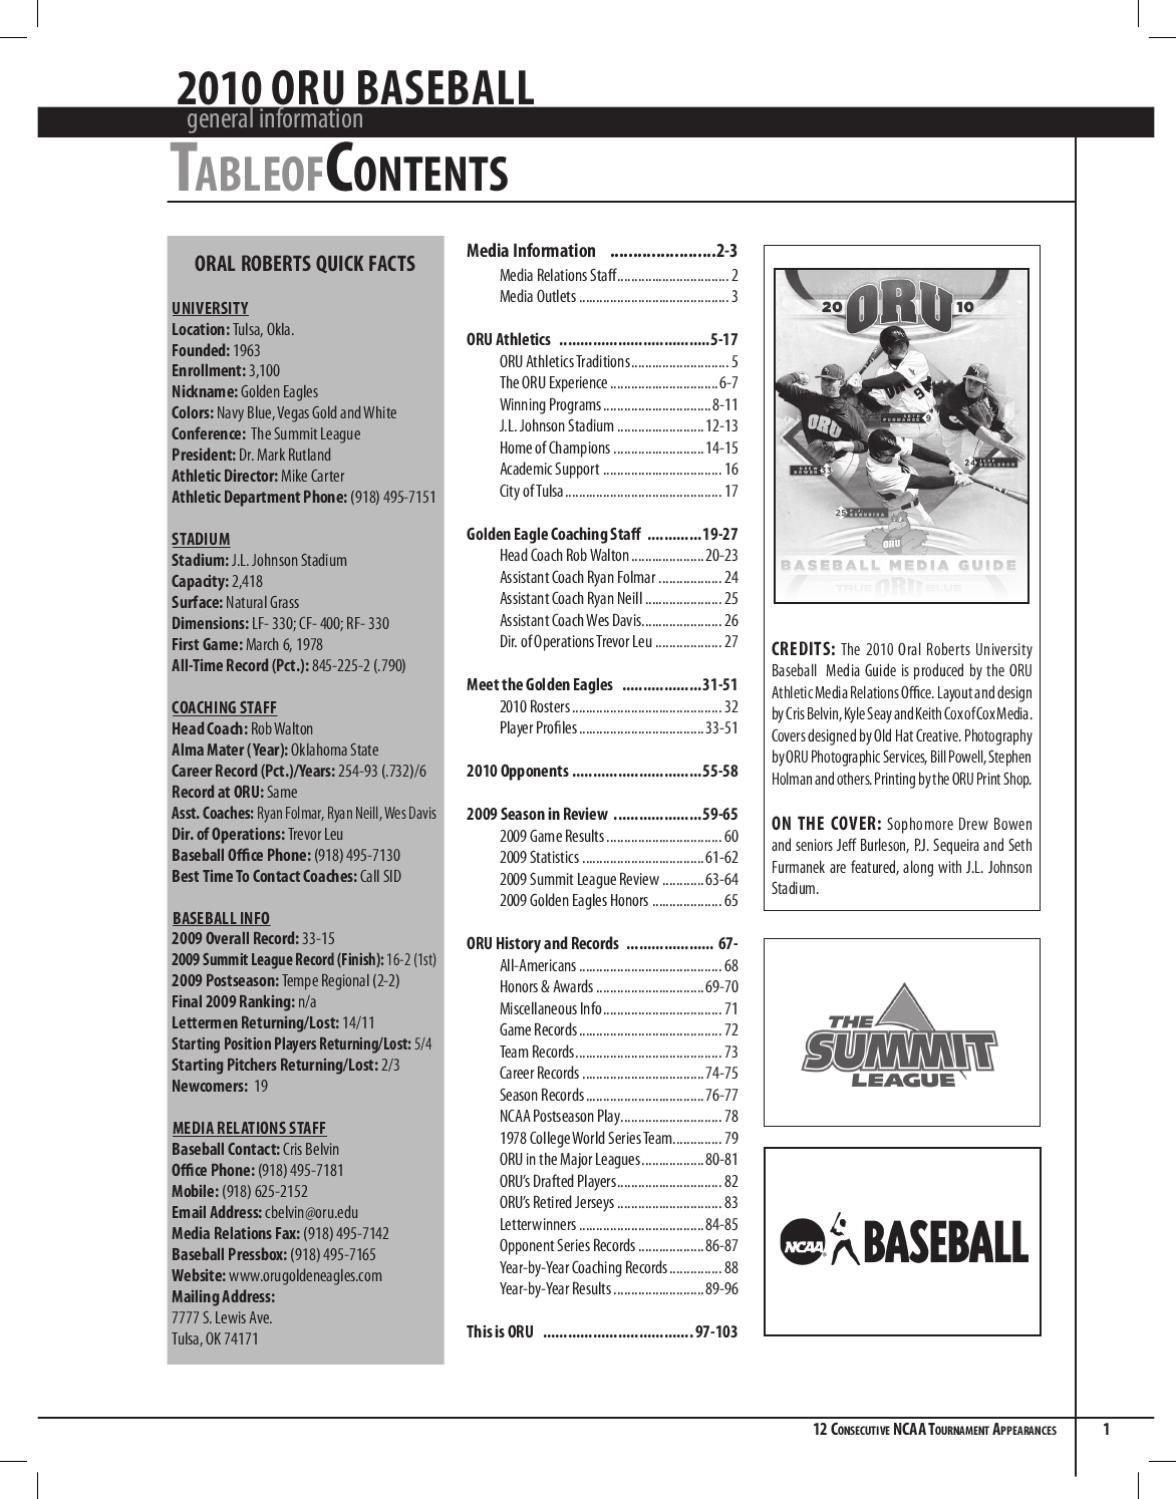 2010 ORU Baseball Media Guide by ORU Athletics - issuu ea9f8c3b576a5